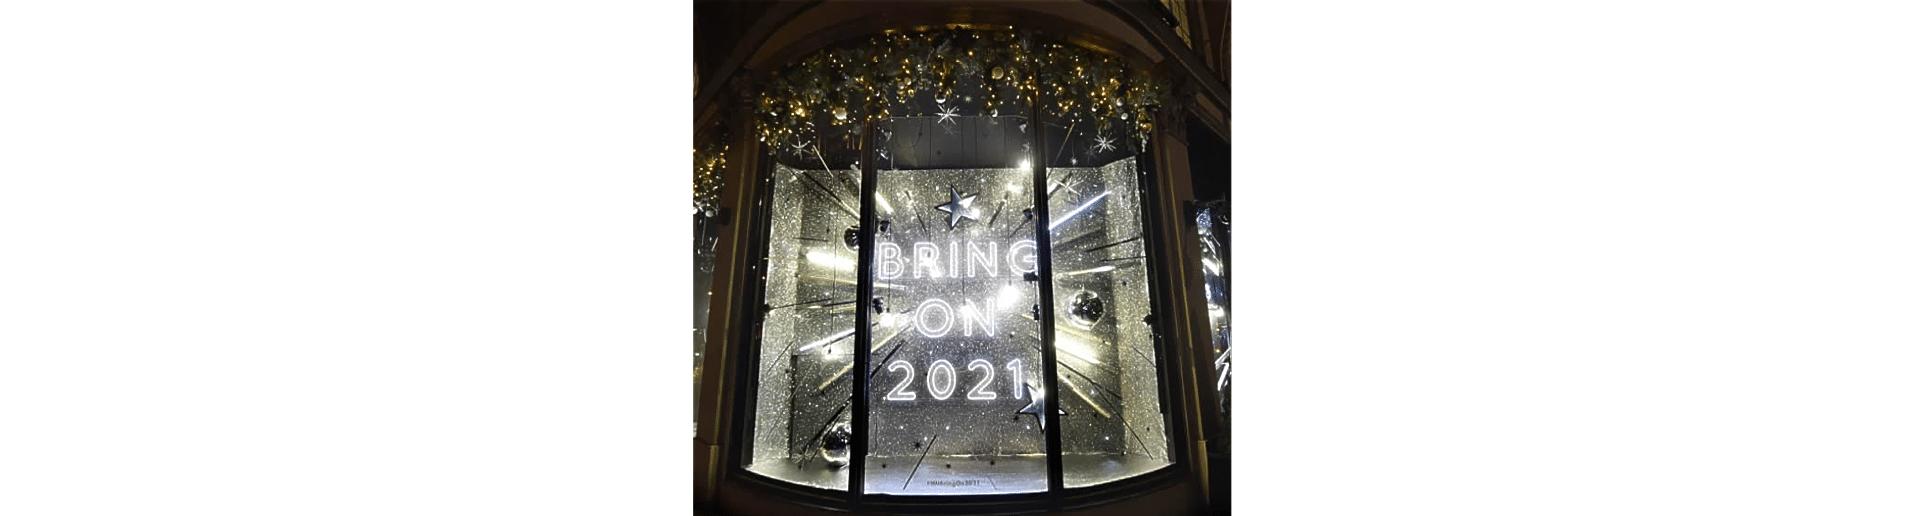 window display - bring on 2021